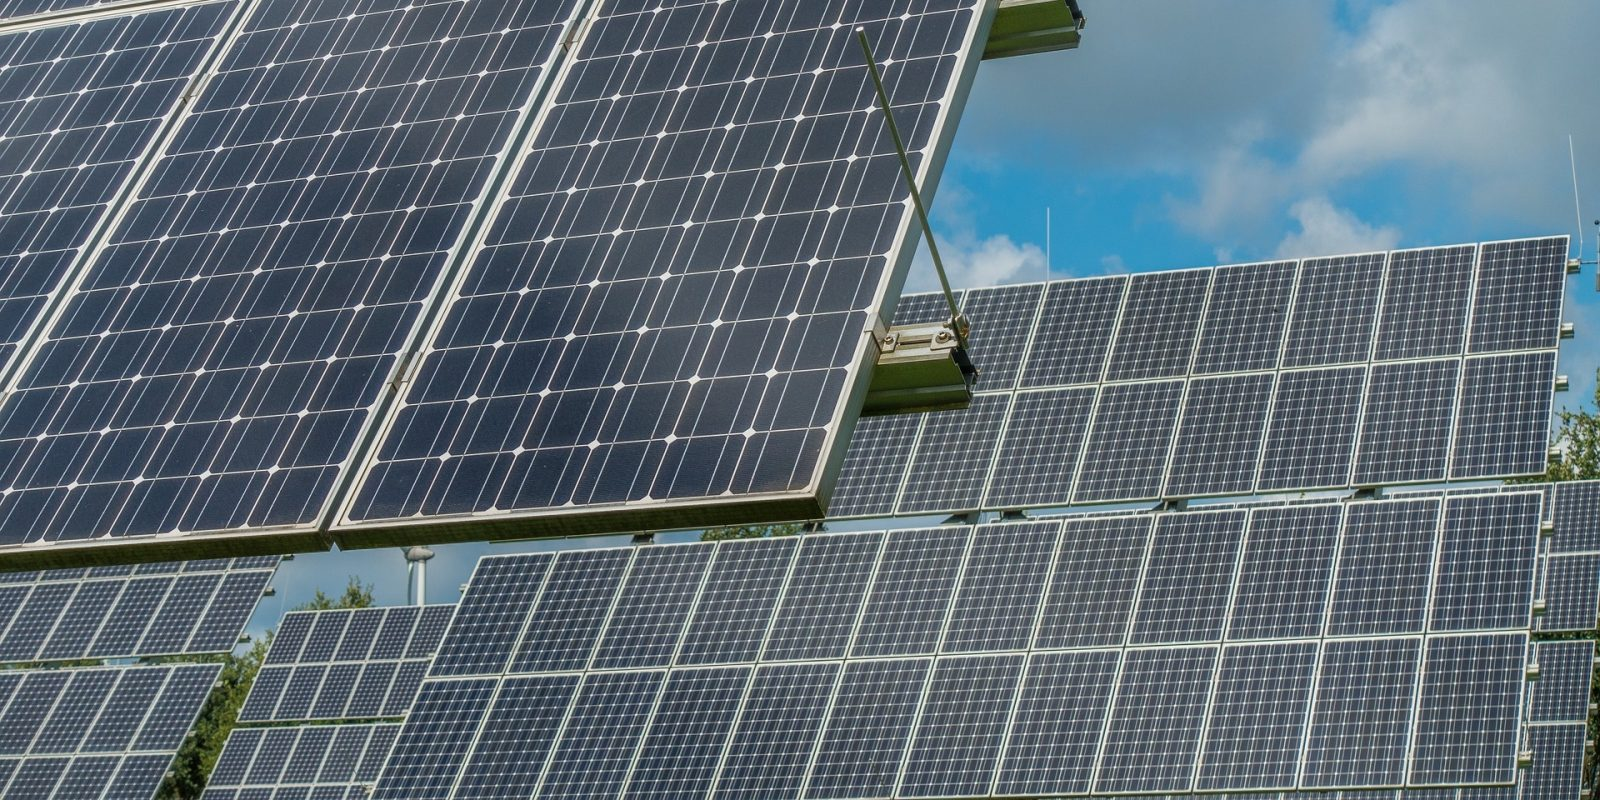 EGEB: Bill for 50% US renewables by 2035, renewables surpass coal in US, European solar rebound